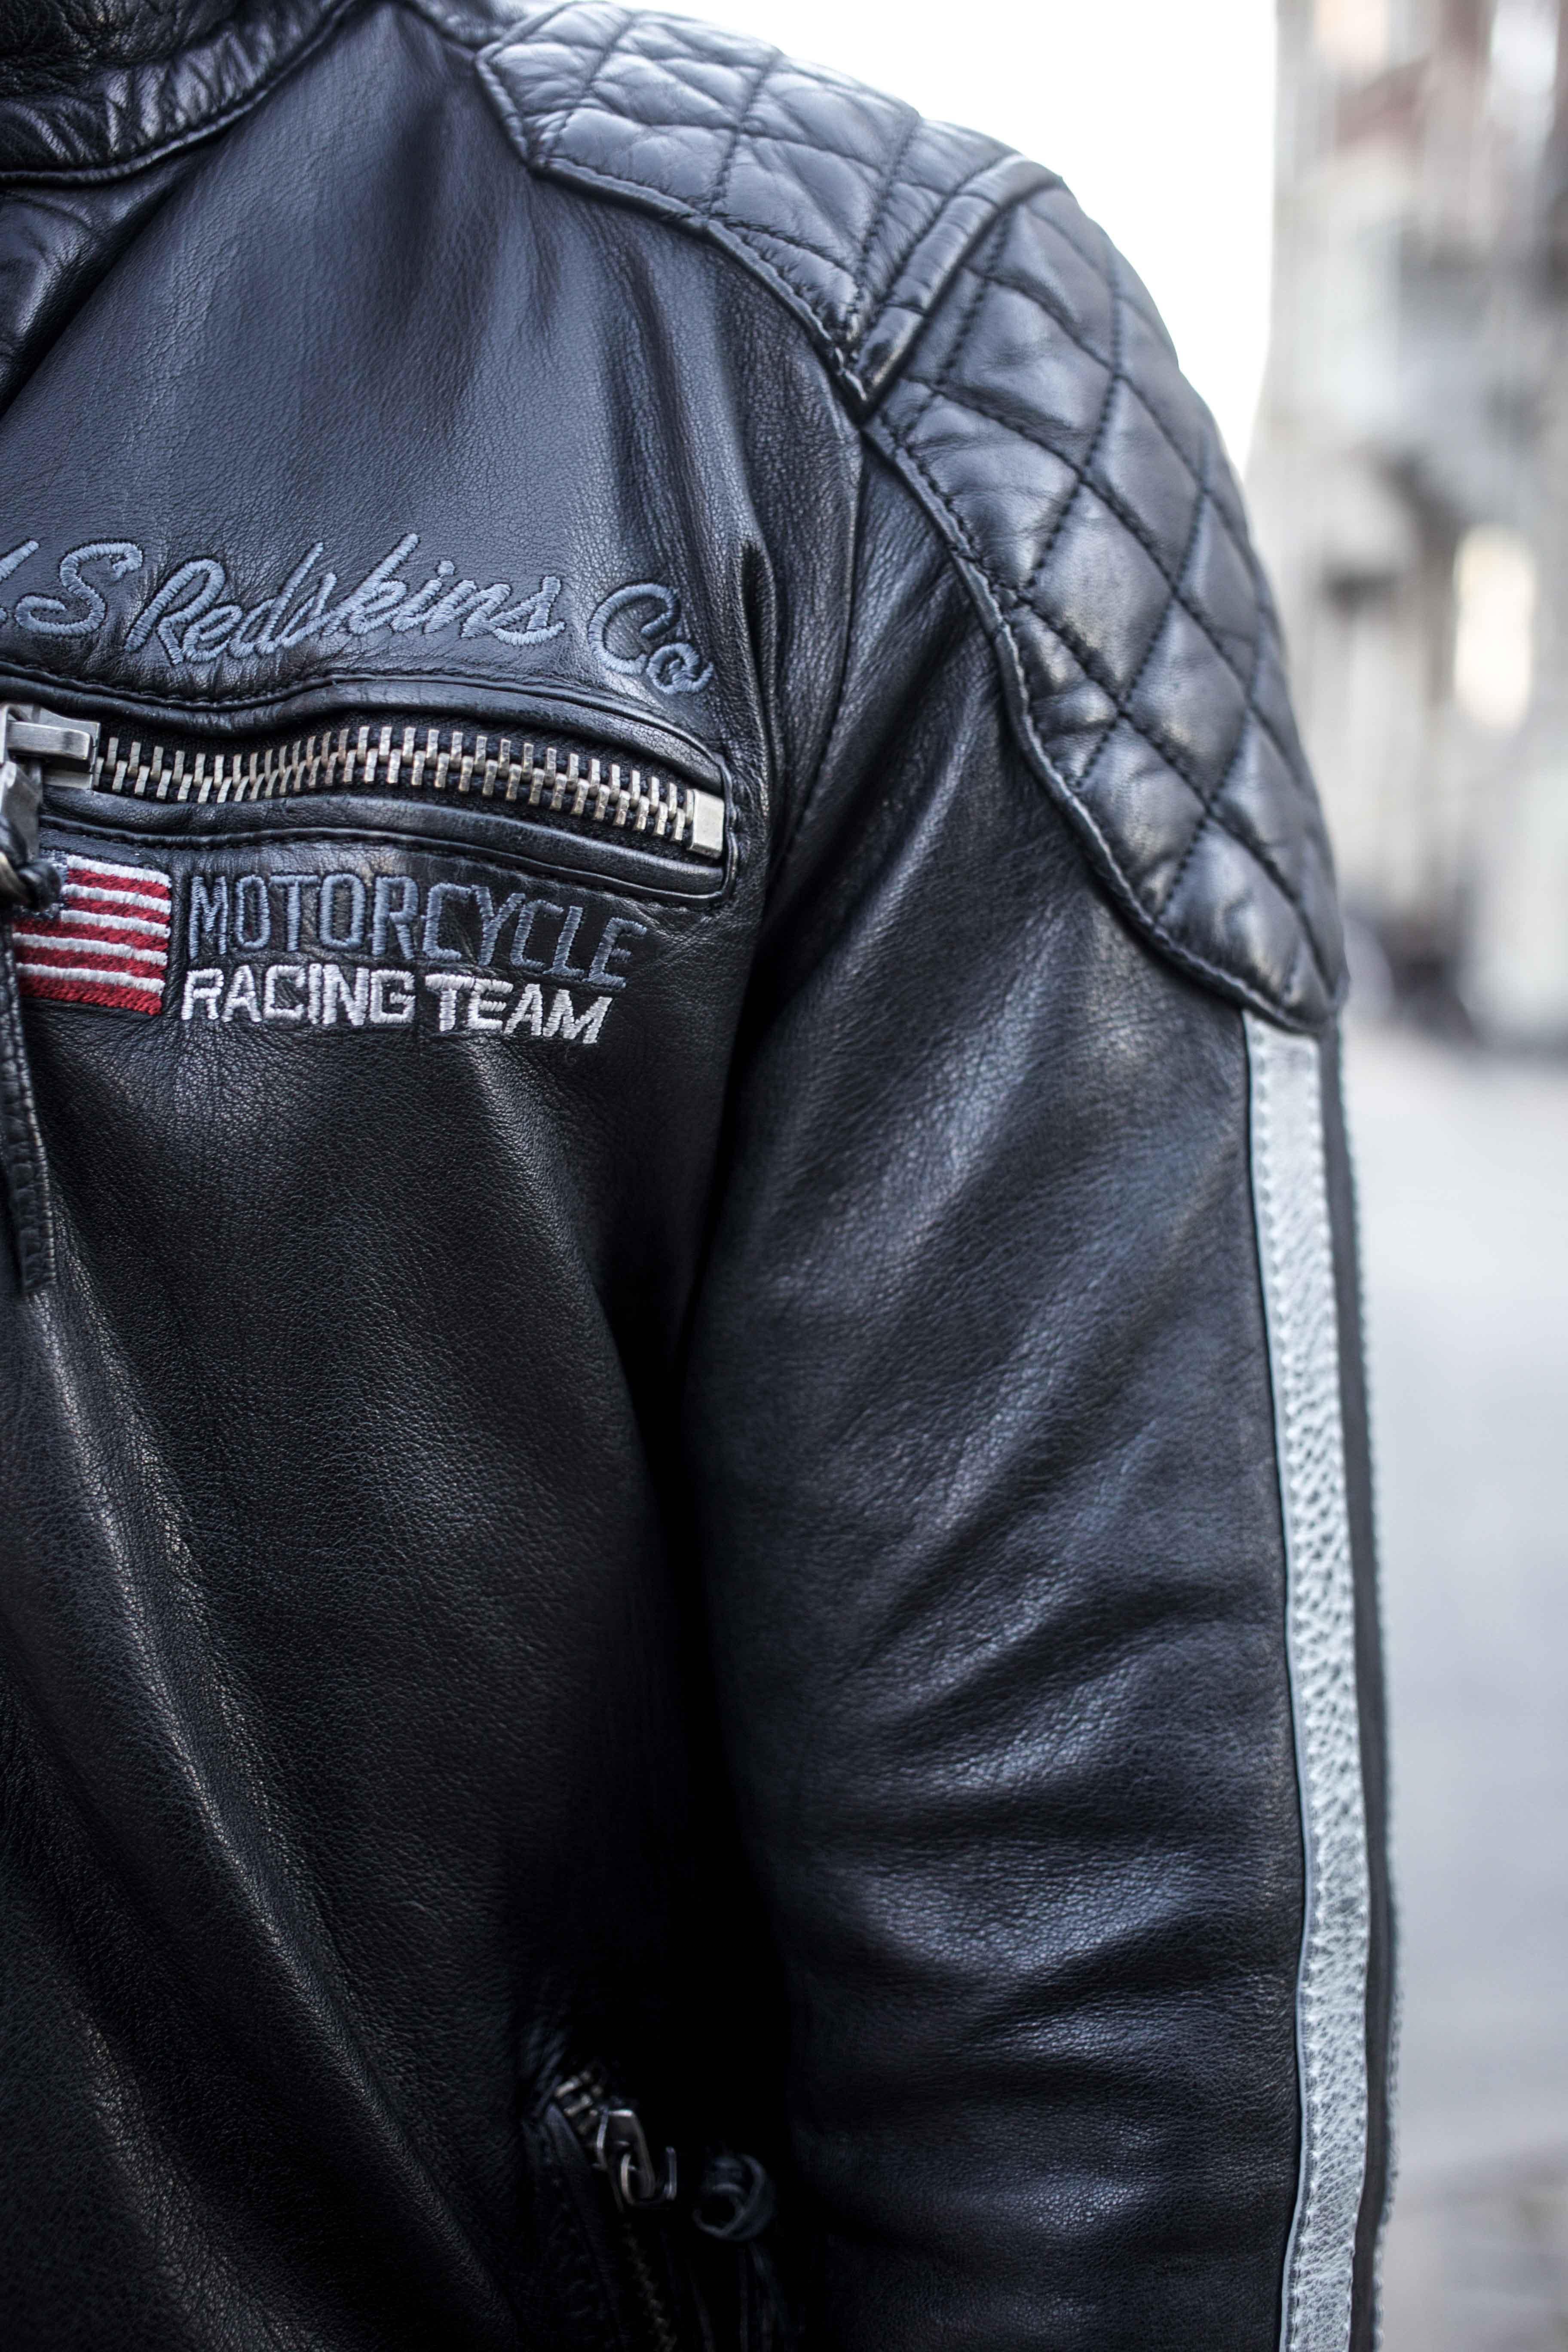 biker-lederjacke-rockiges-outfit-fashionblog-modeblog-berlin-kopenhagen-bikerboots_5376